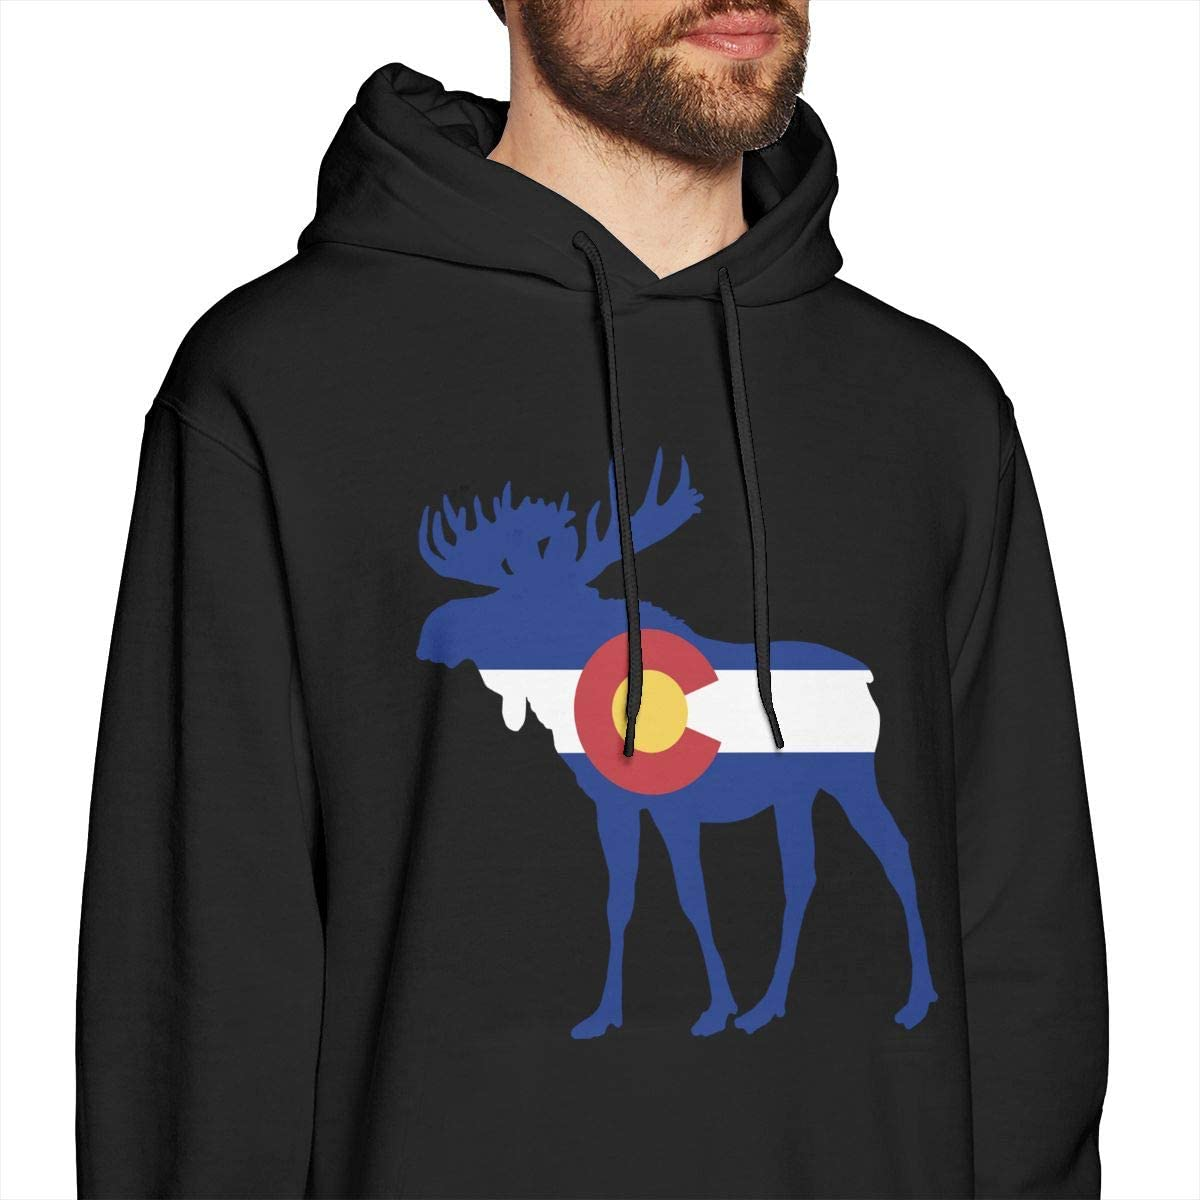 Mens Hoodies Colorado Flag Moose Funny Pullover Hooded Print Sweatshirt Jackets